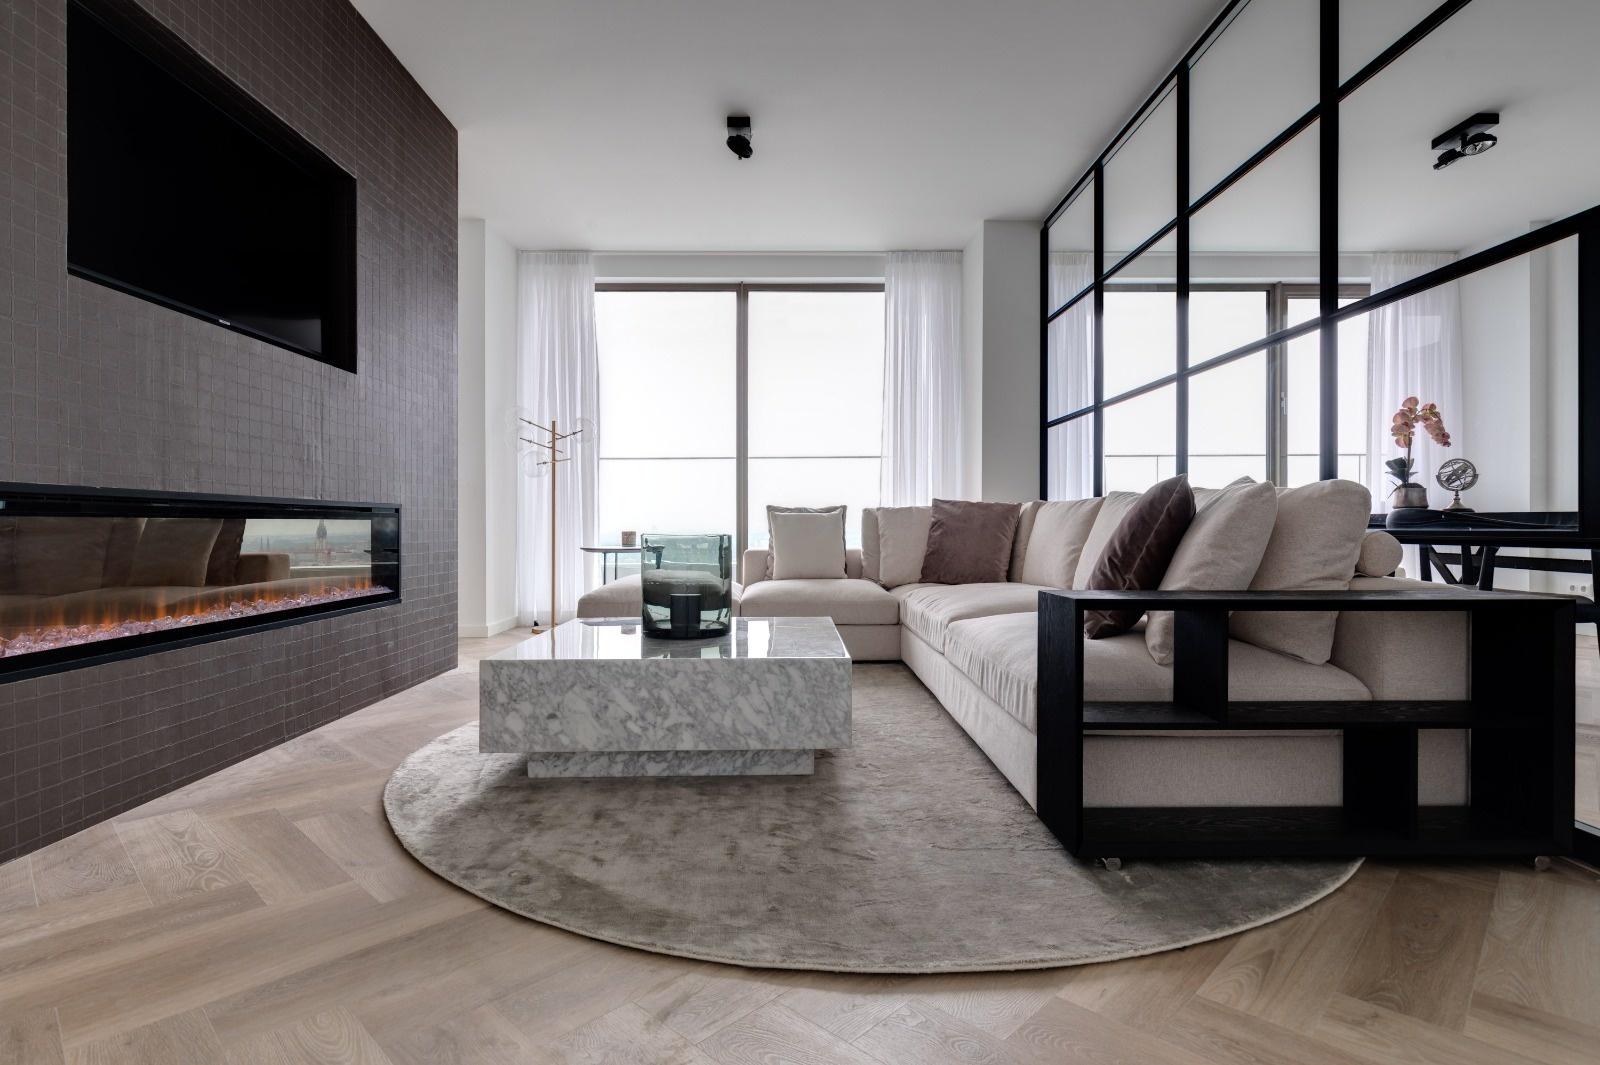 CHIANTI ROUND Carpet Spray Green 280cm-3